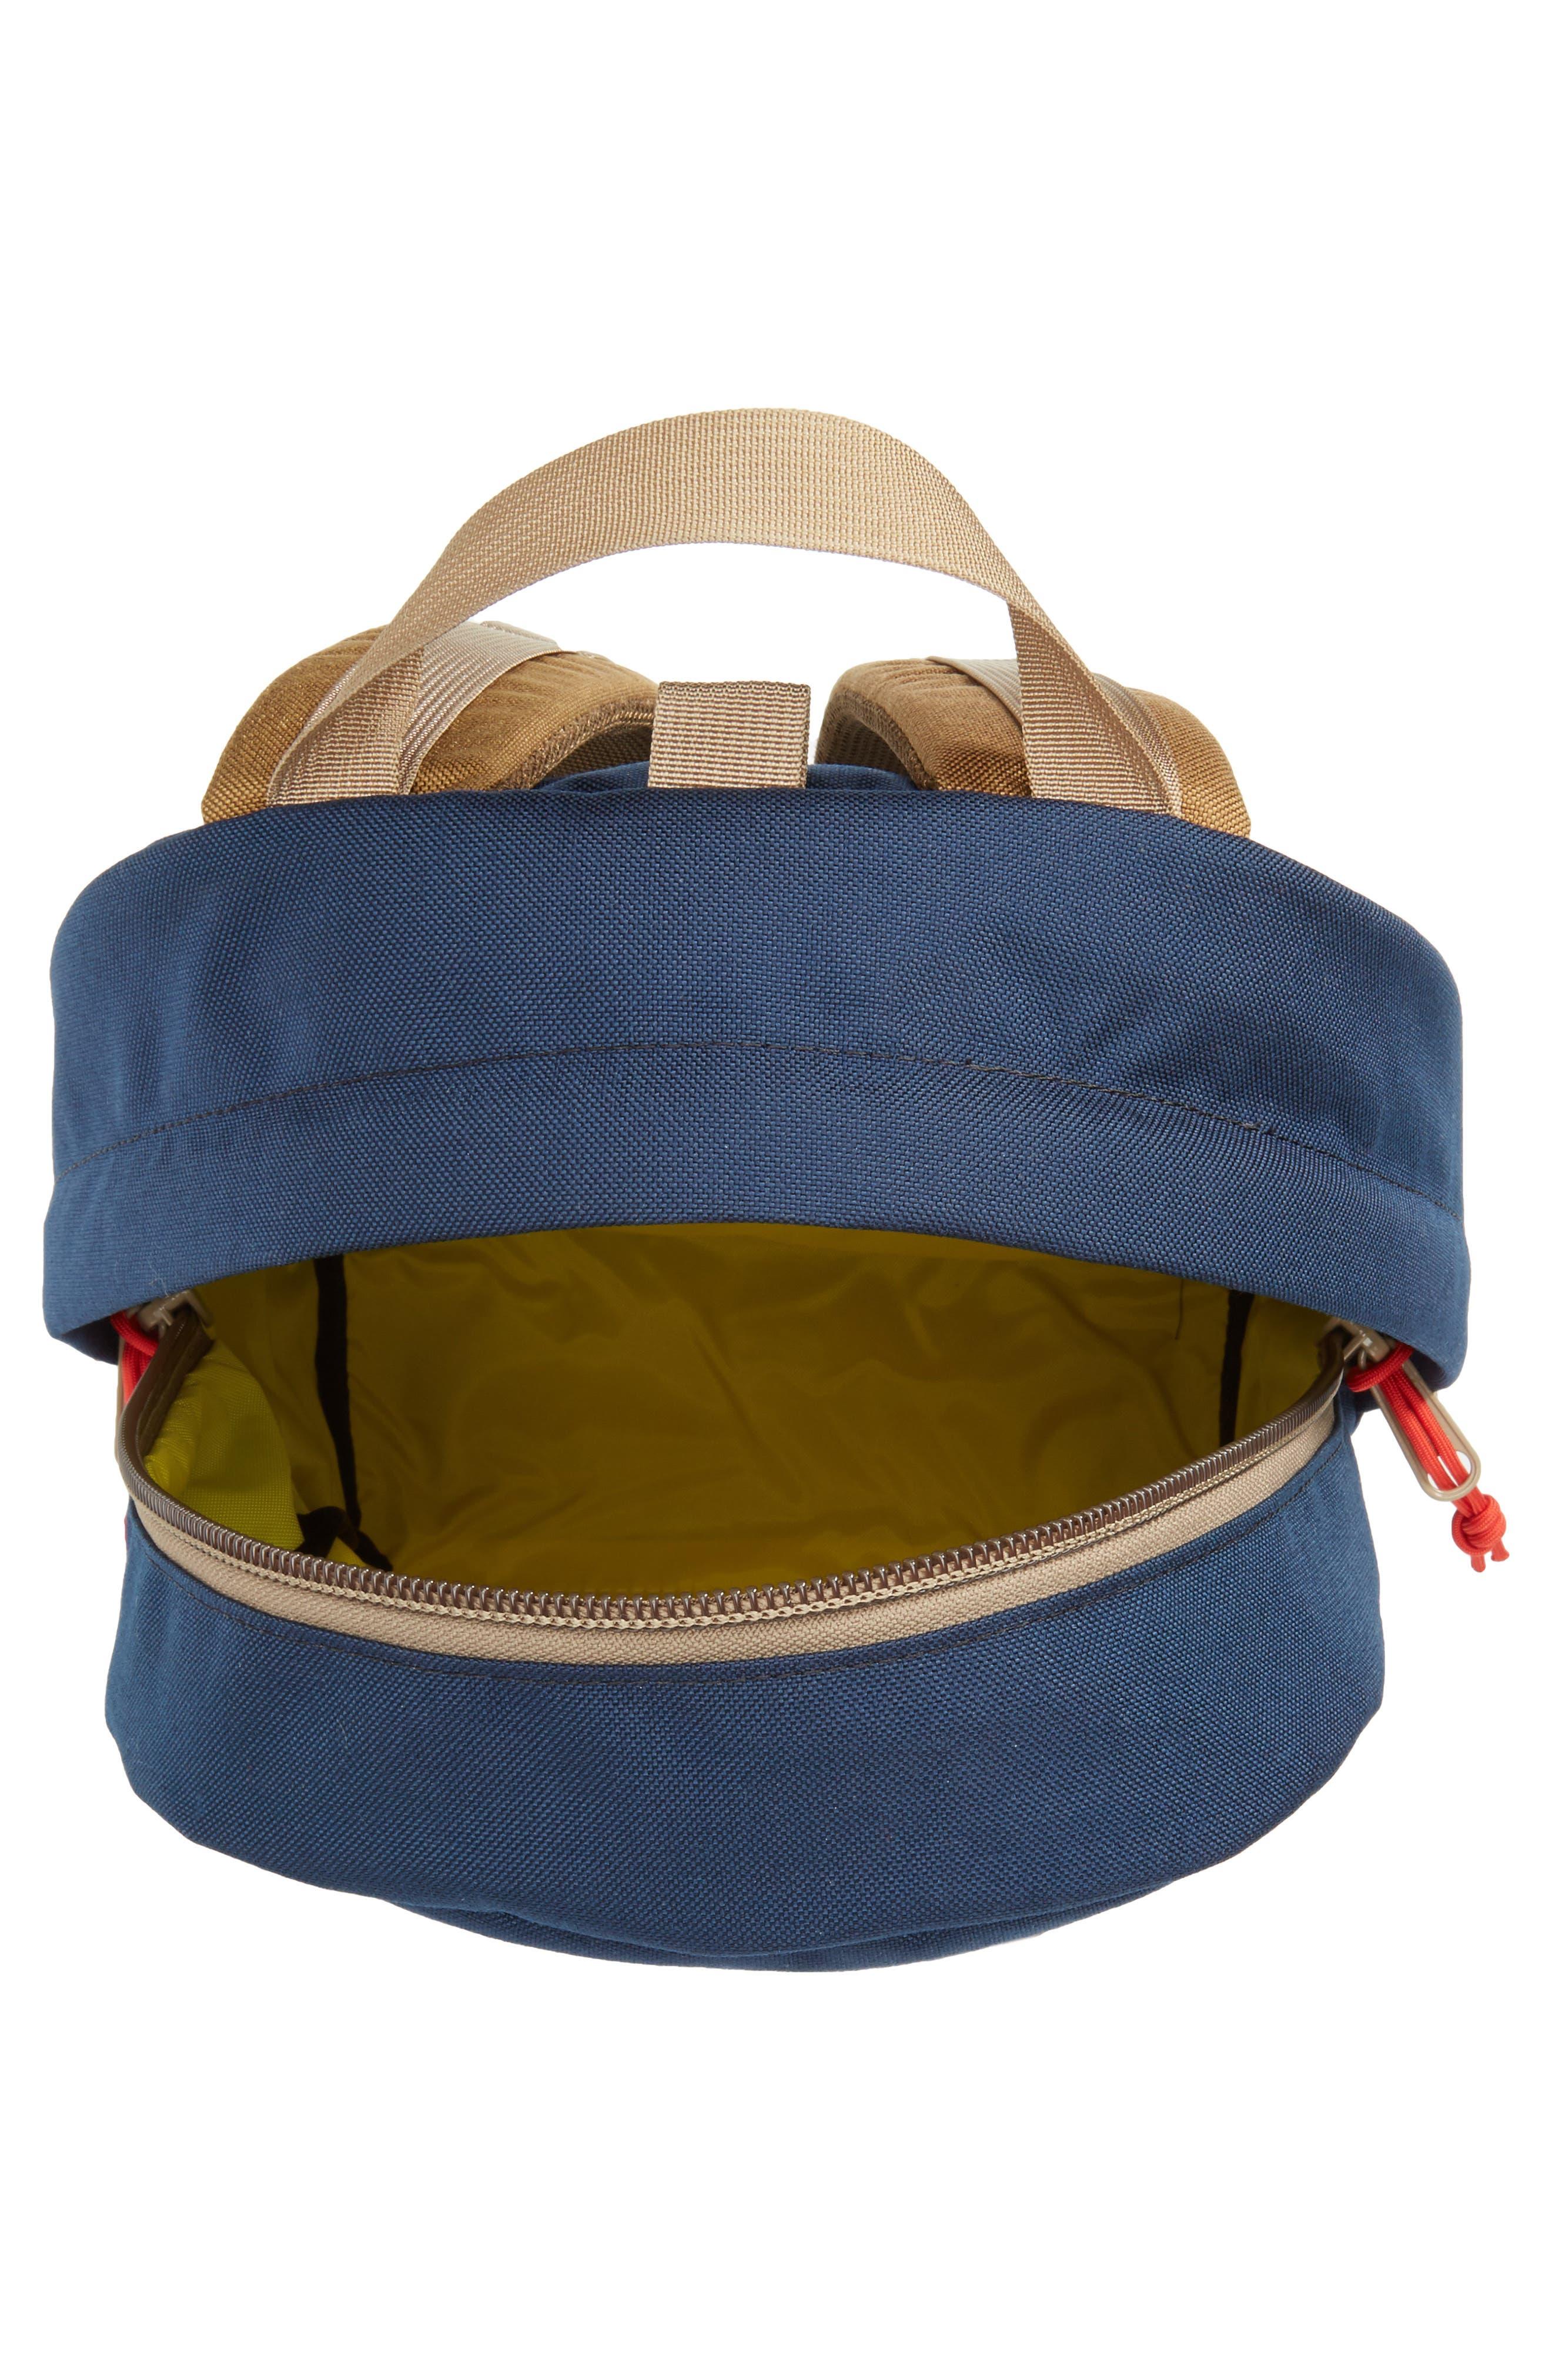 Daypack,                             Alternate thumbnail 8, color,